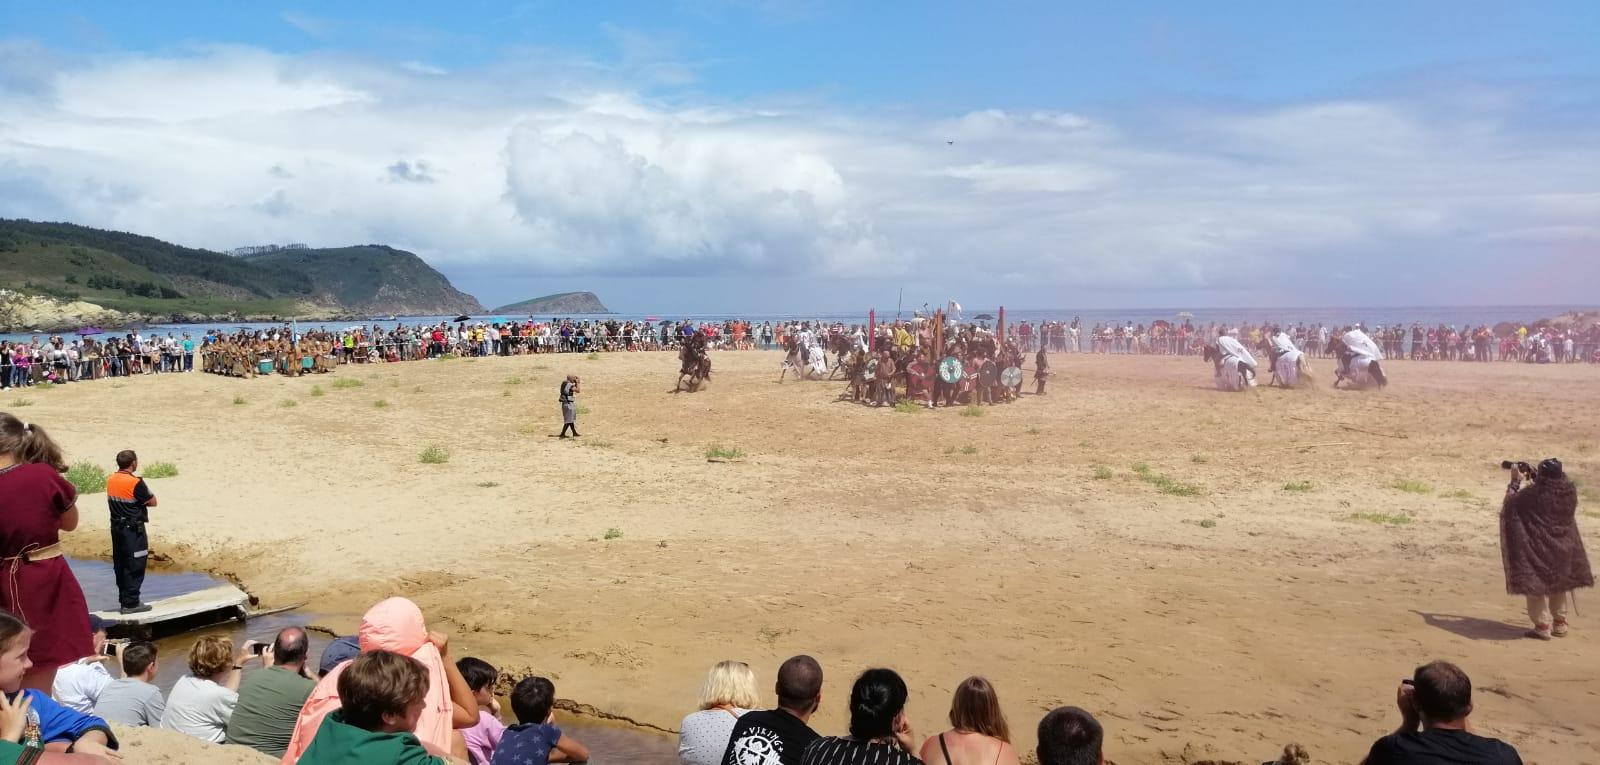 Crónica IV Romaxe viquinga O Vicedo, 2019 Historia, Ferias y mercados normandos/vikingos